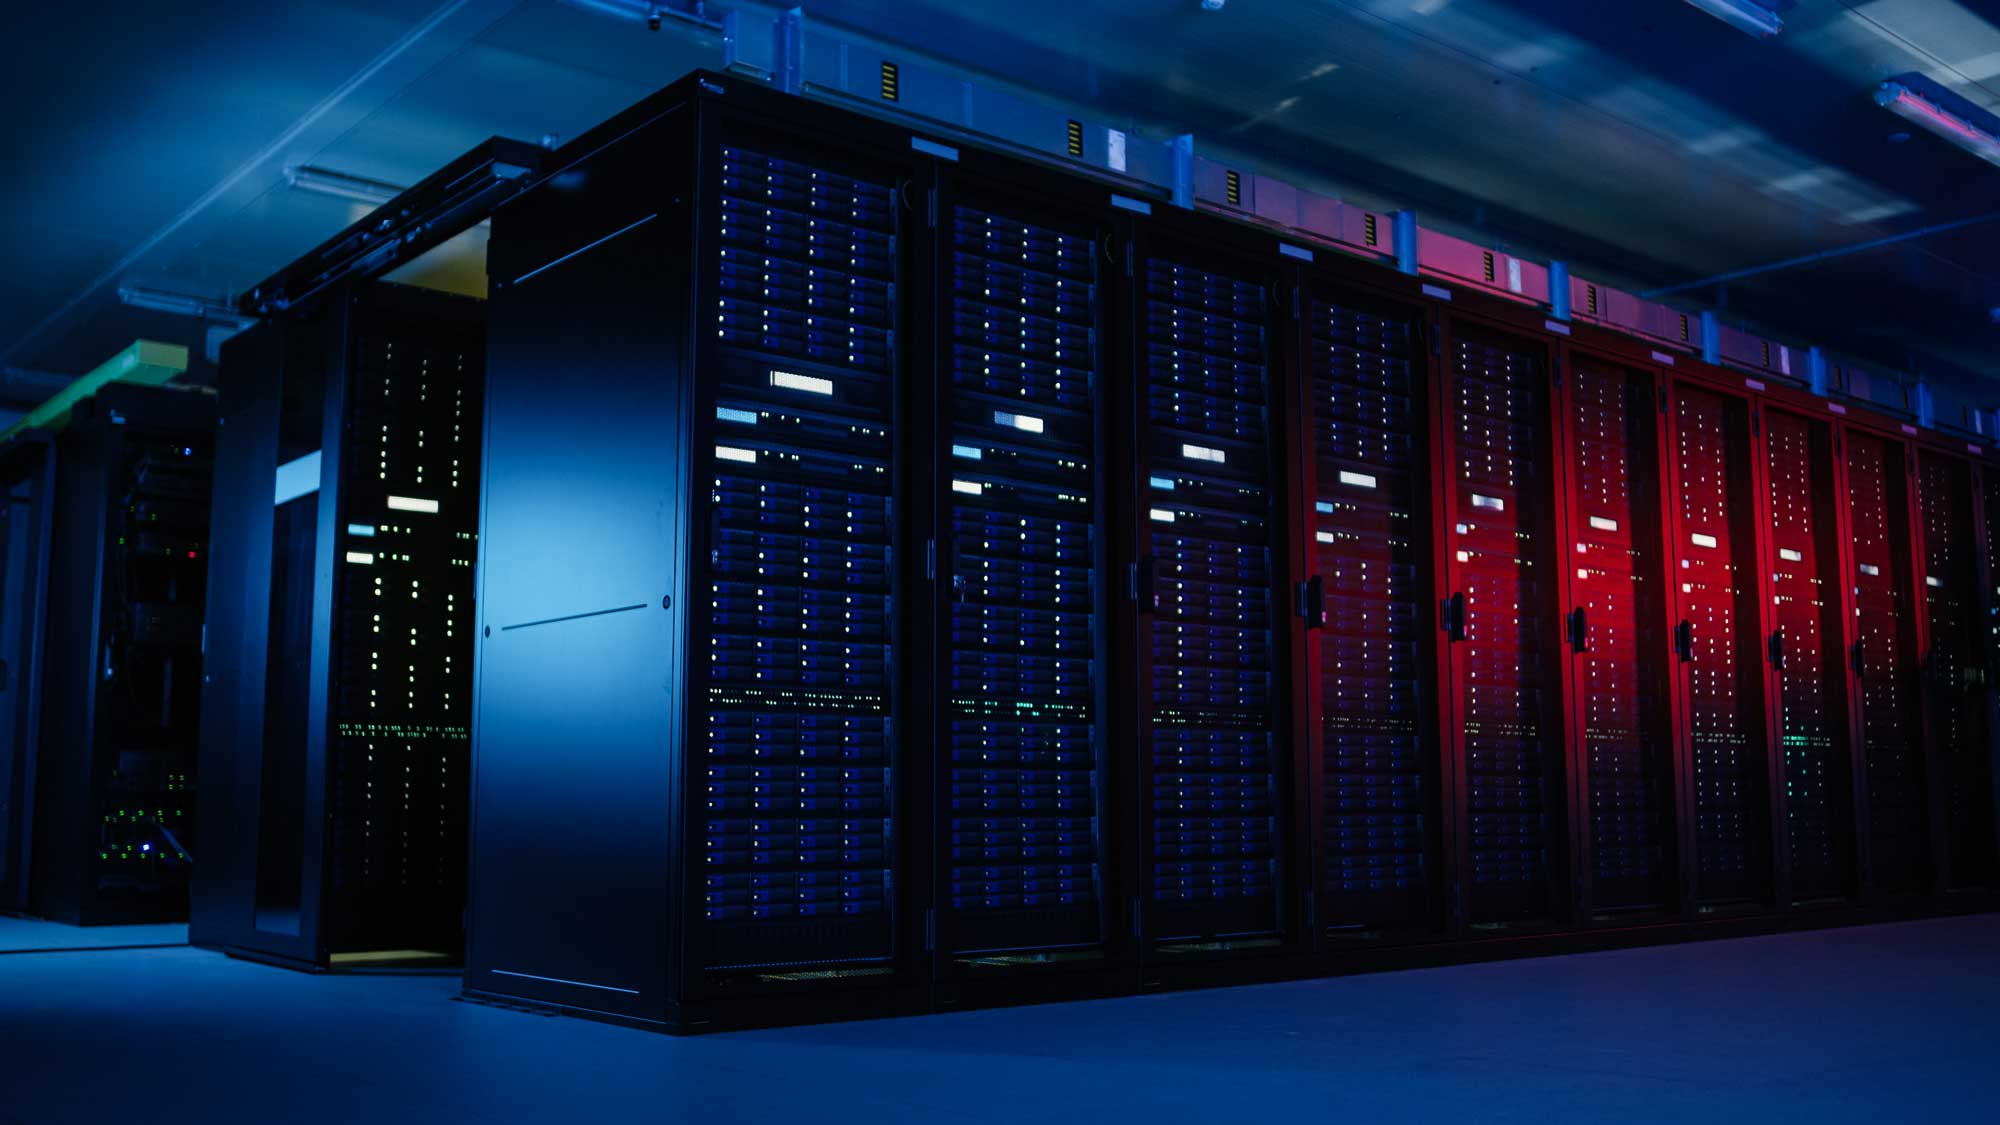 Master data management servers room background